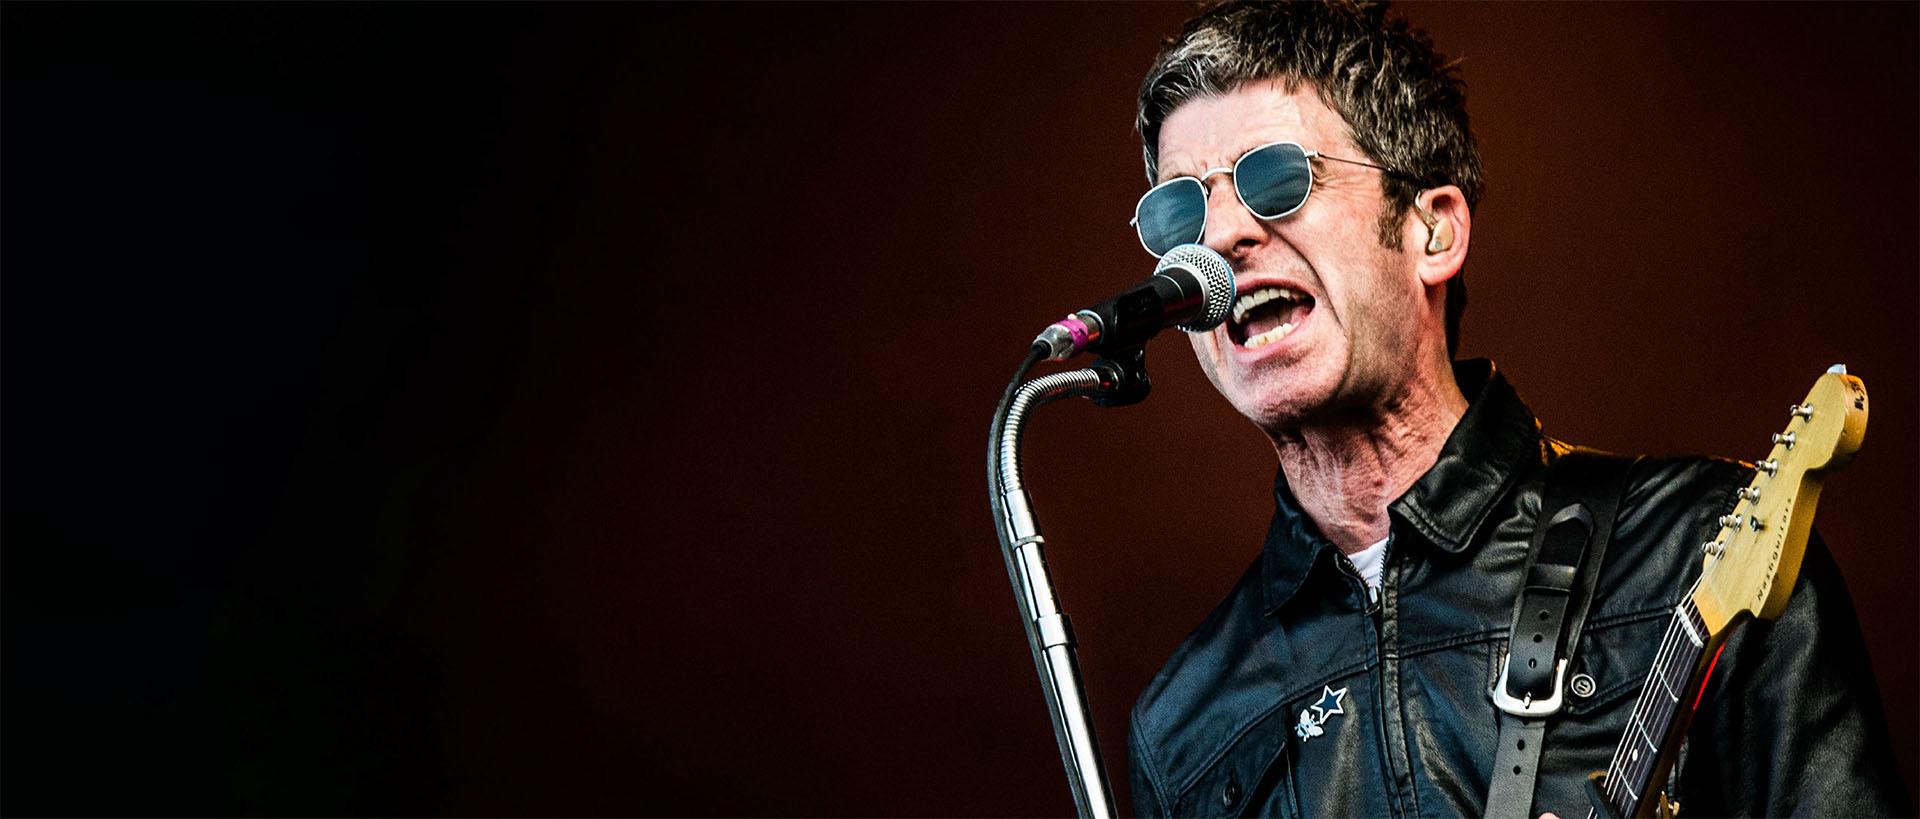 Willy Radio Noel Gallagher